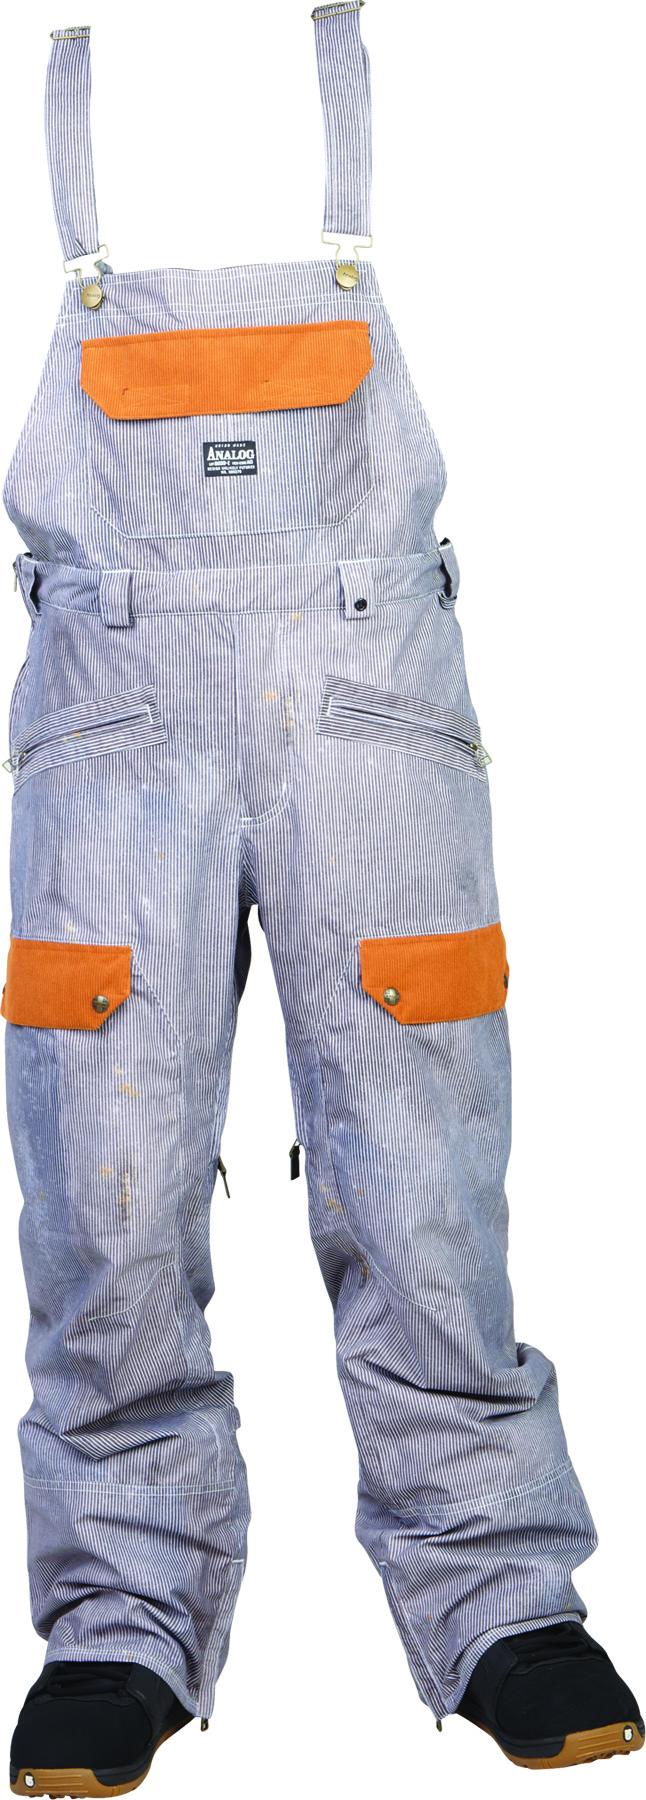 Spodnie Snowboardowe Analog Alder Bib (Hickory Stripe)